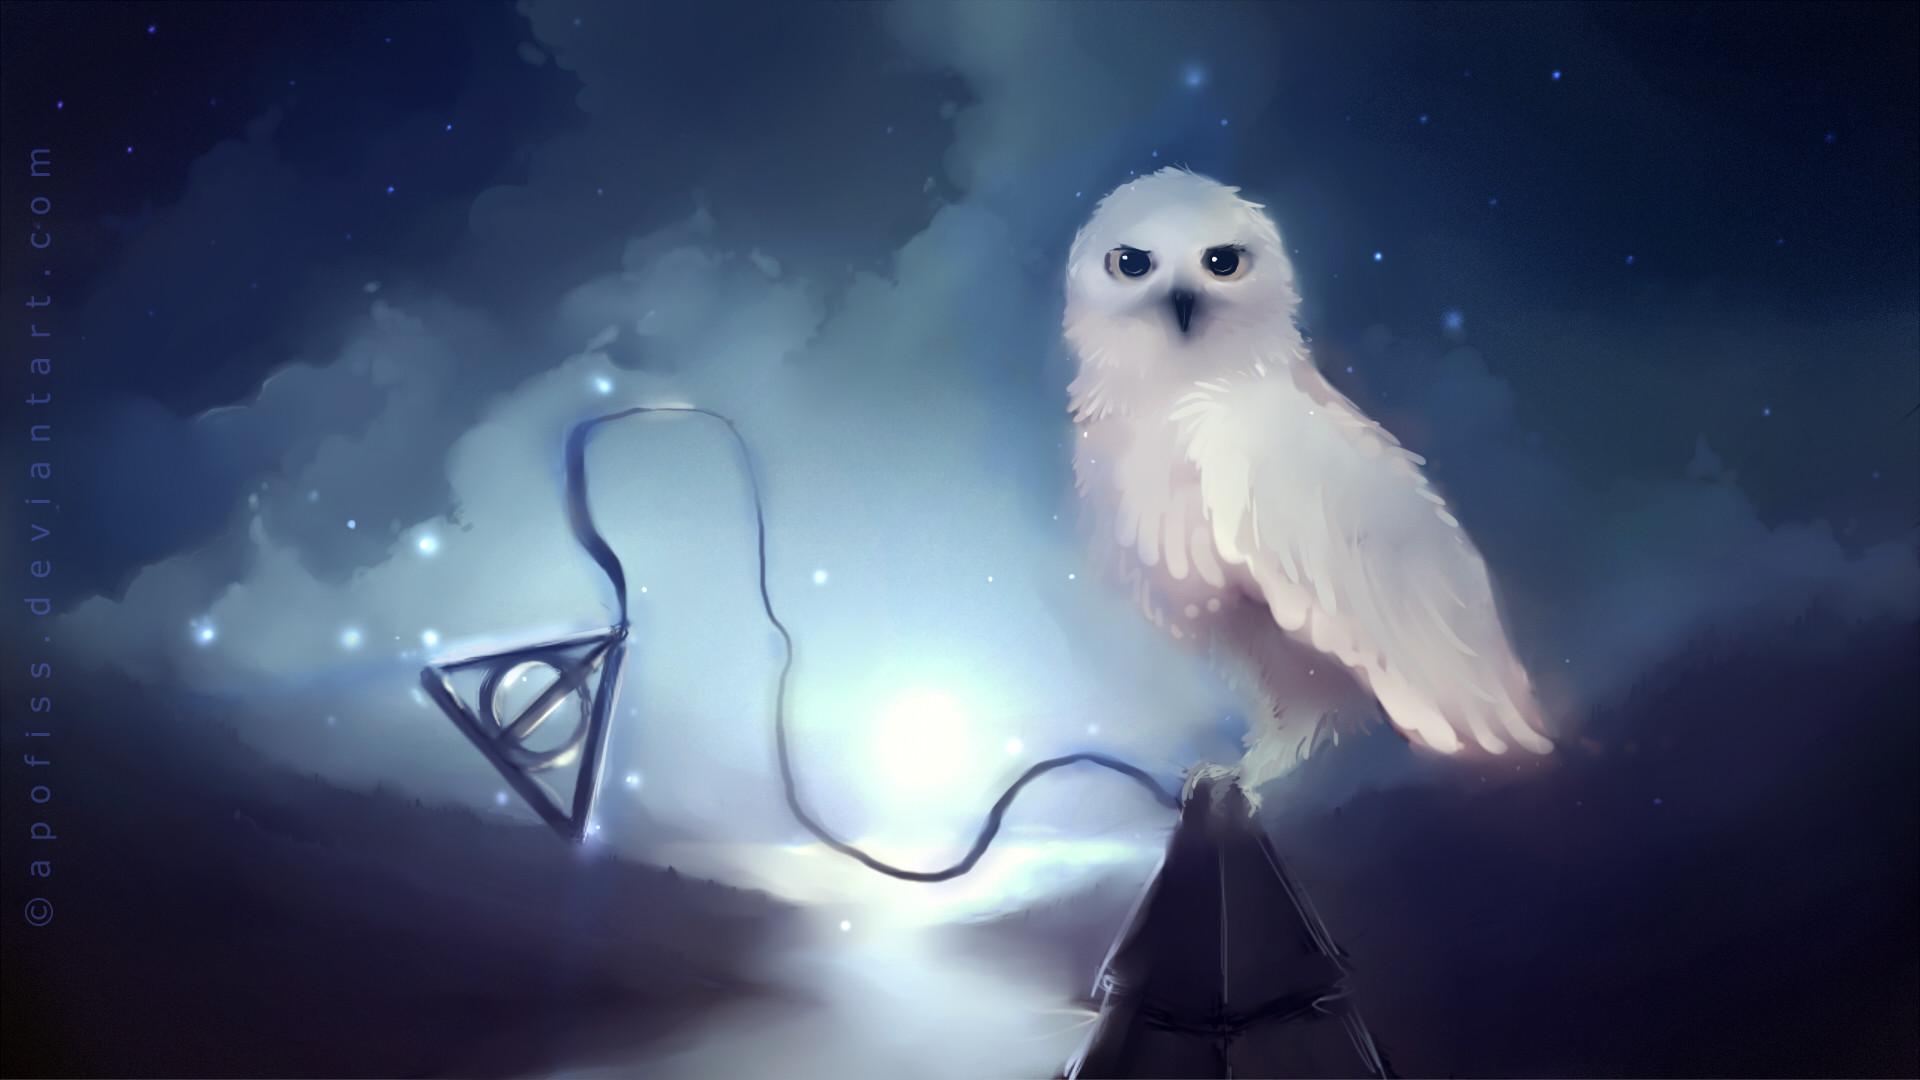 Hedwig · download Hedwig image